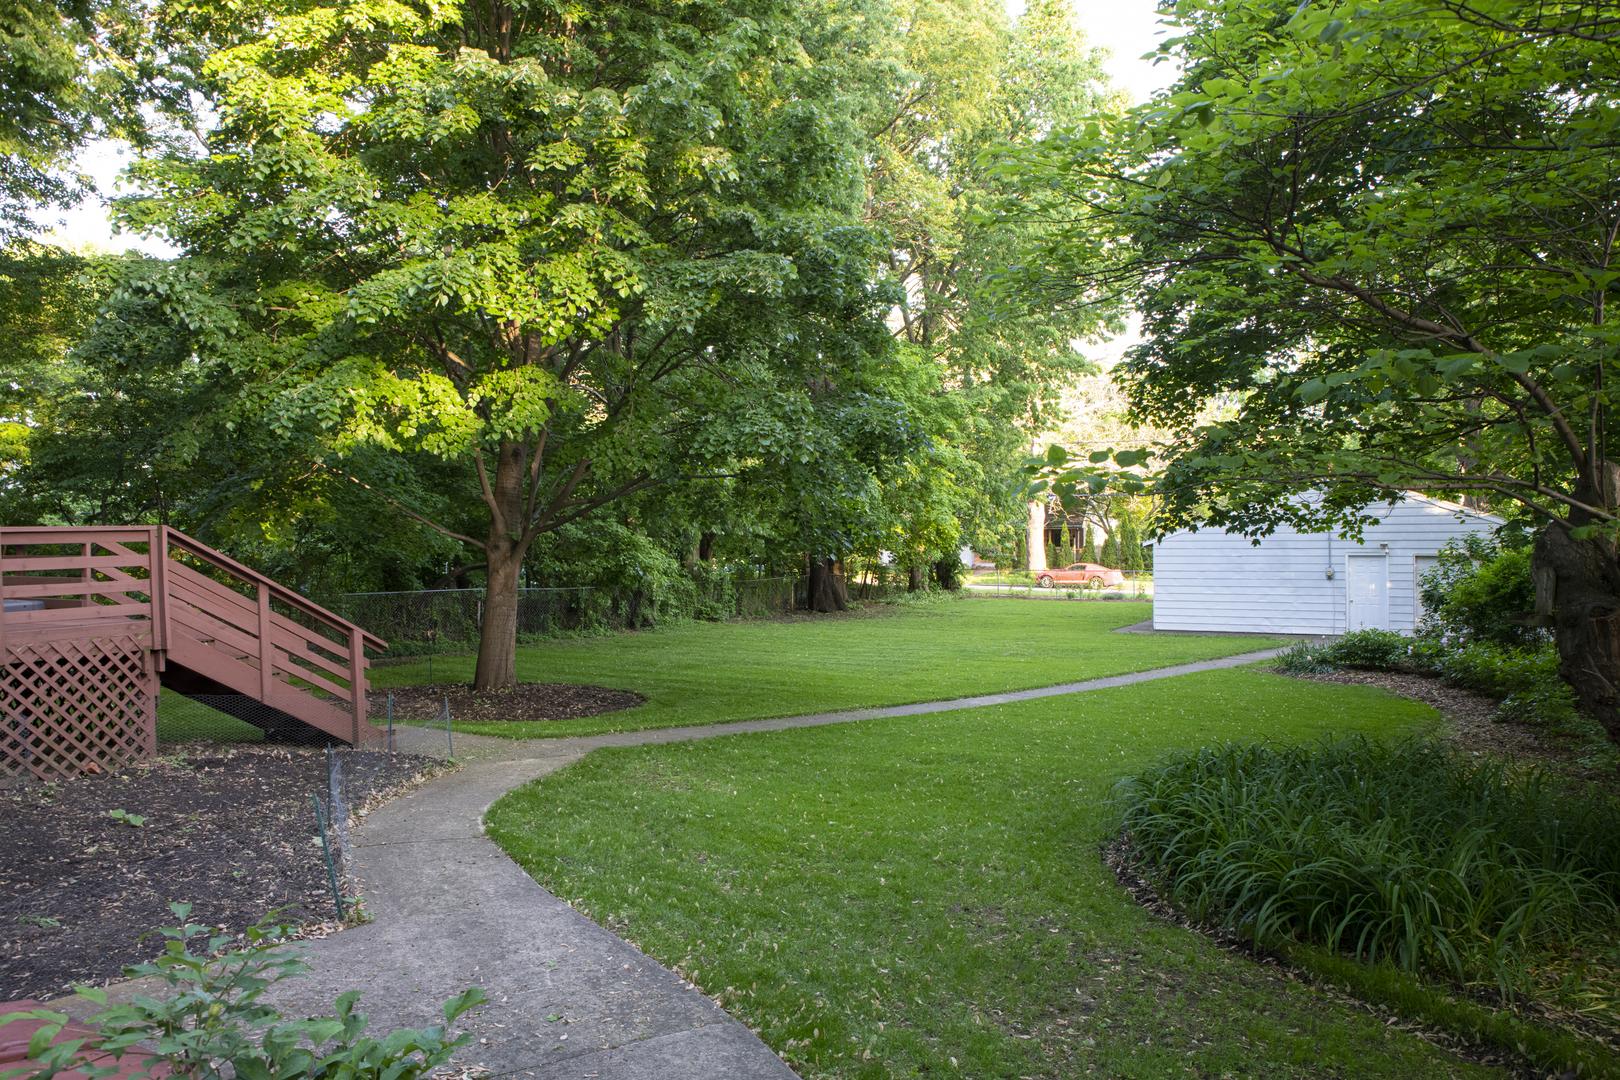 803 West University, Champaign, Illinois, 61820